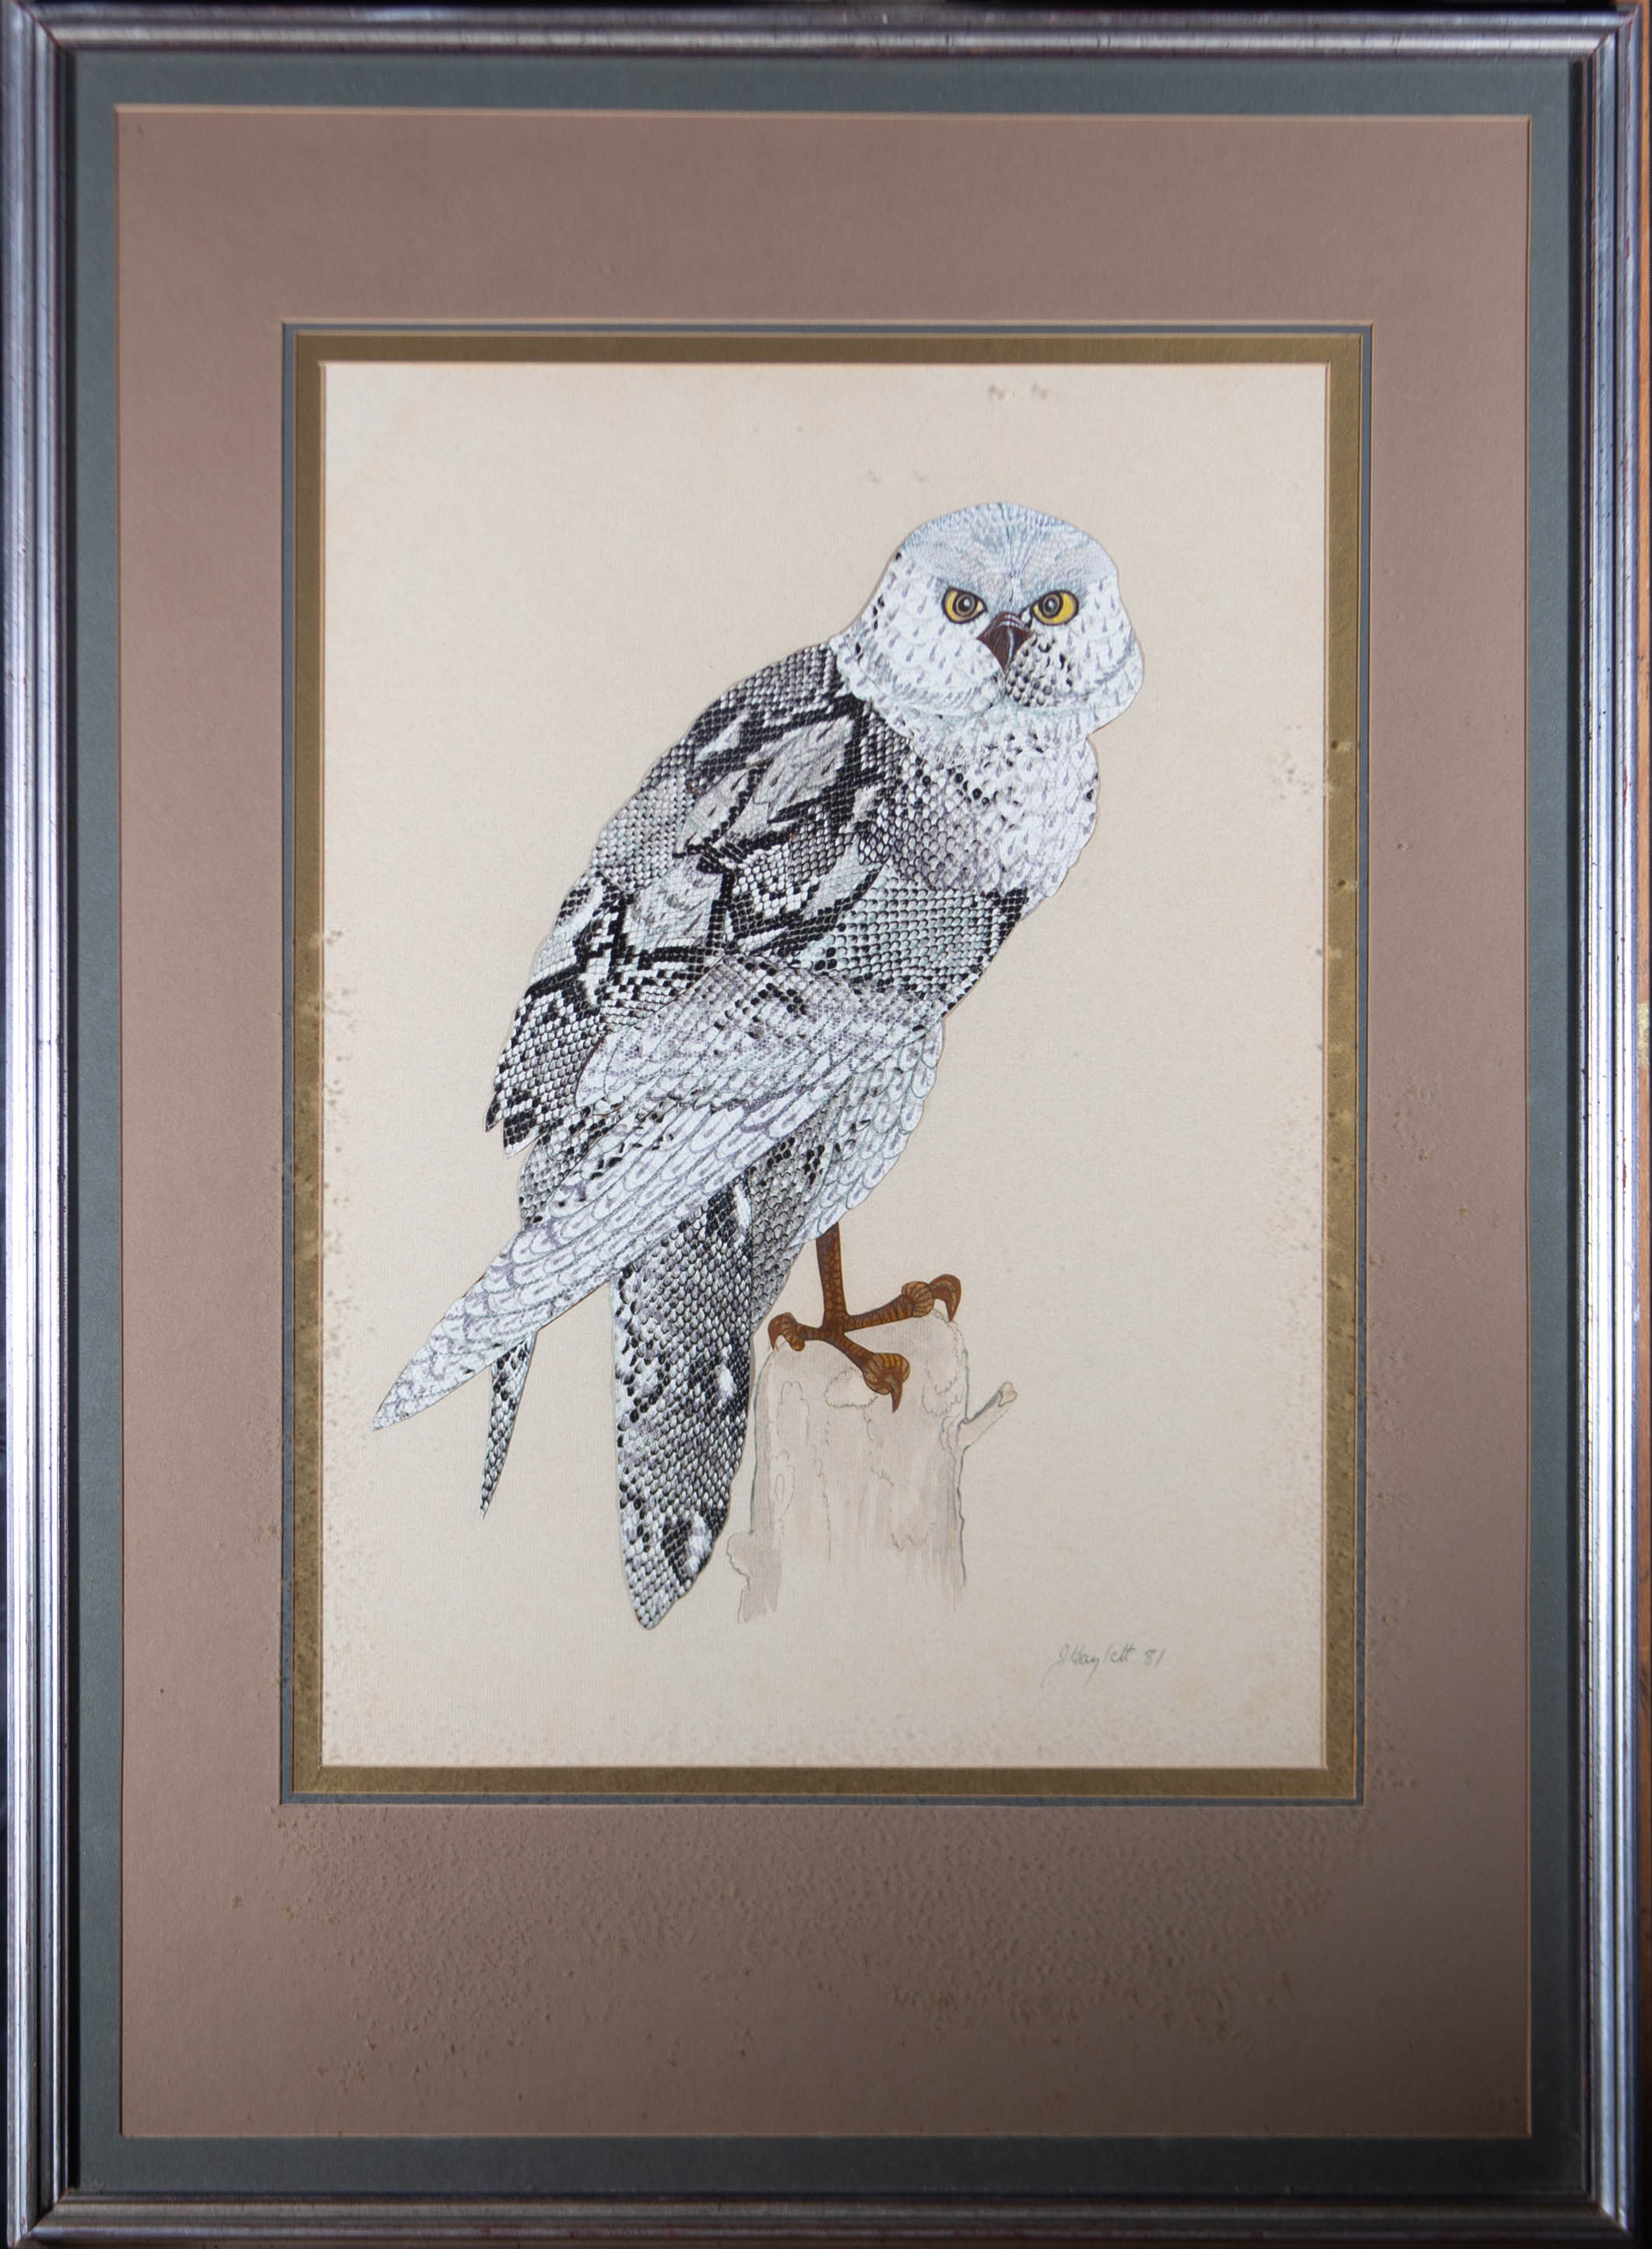 Jean Haylett (1924-2018) - Large 1981 Mixed Media Collage, Owl